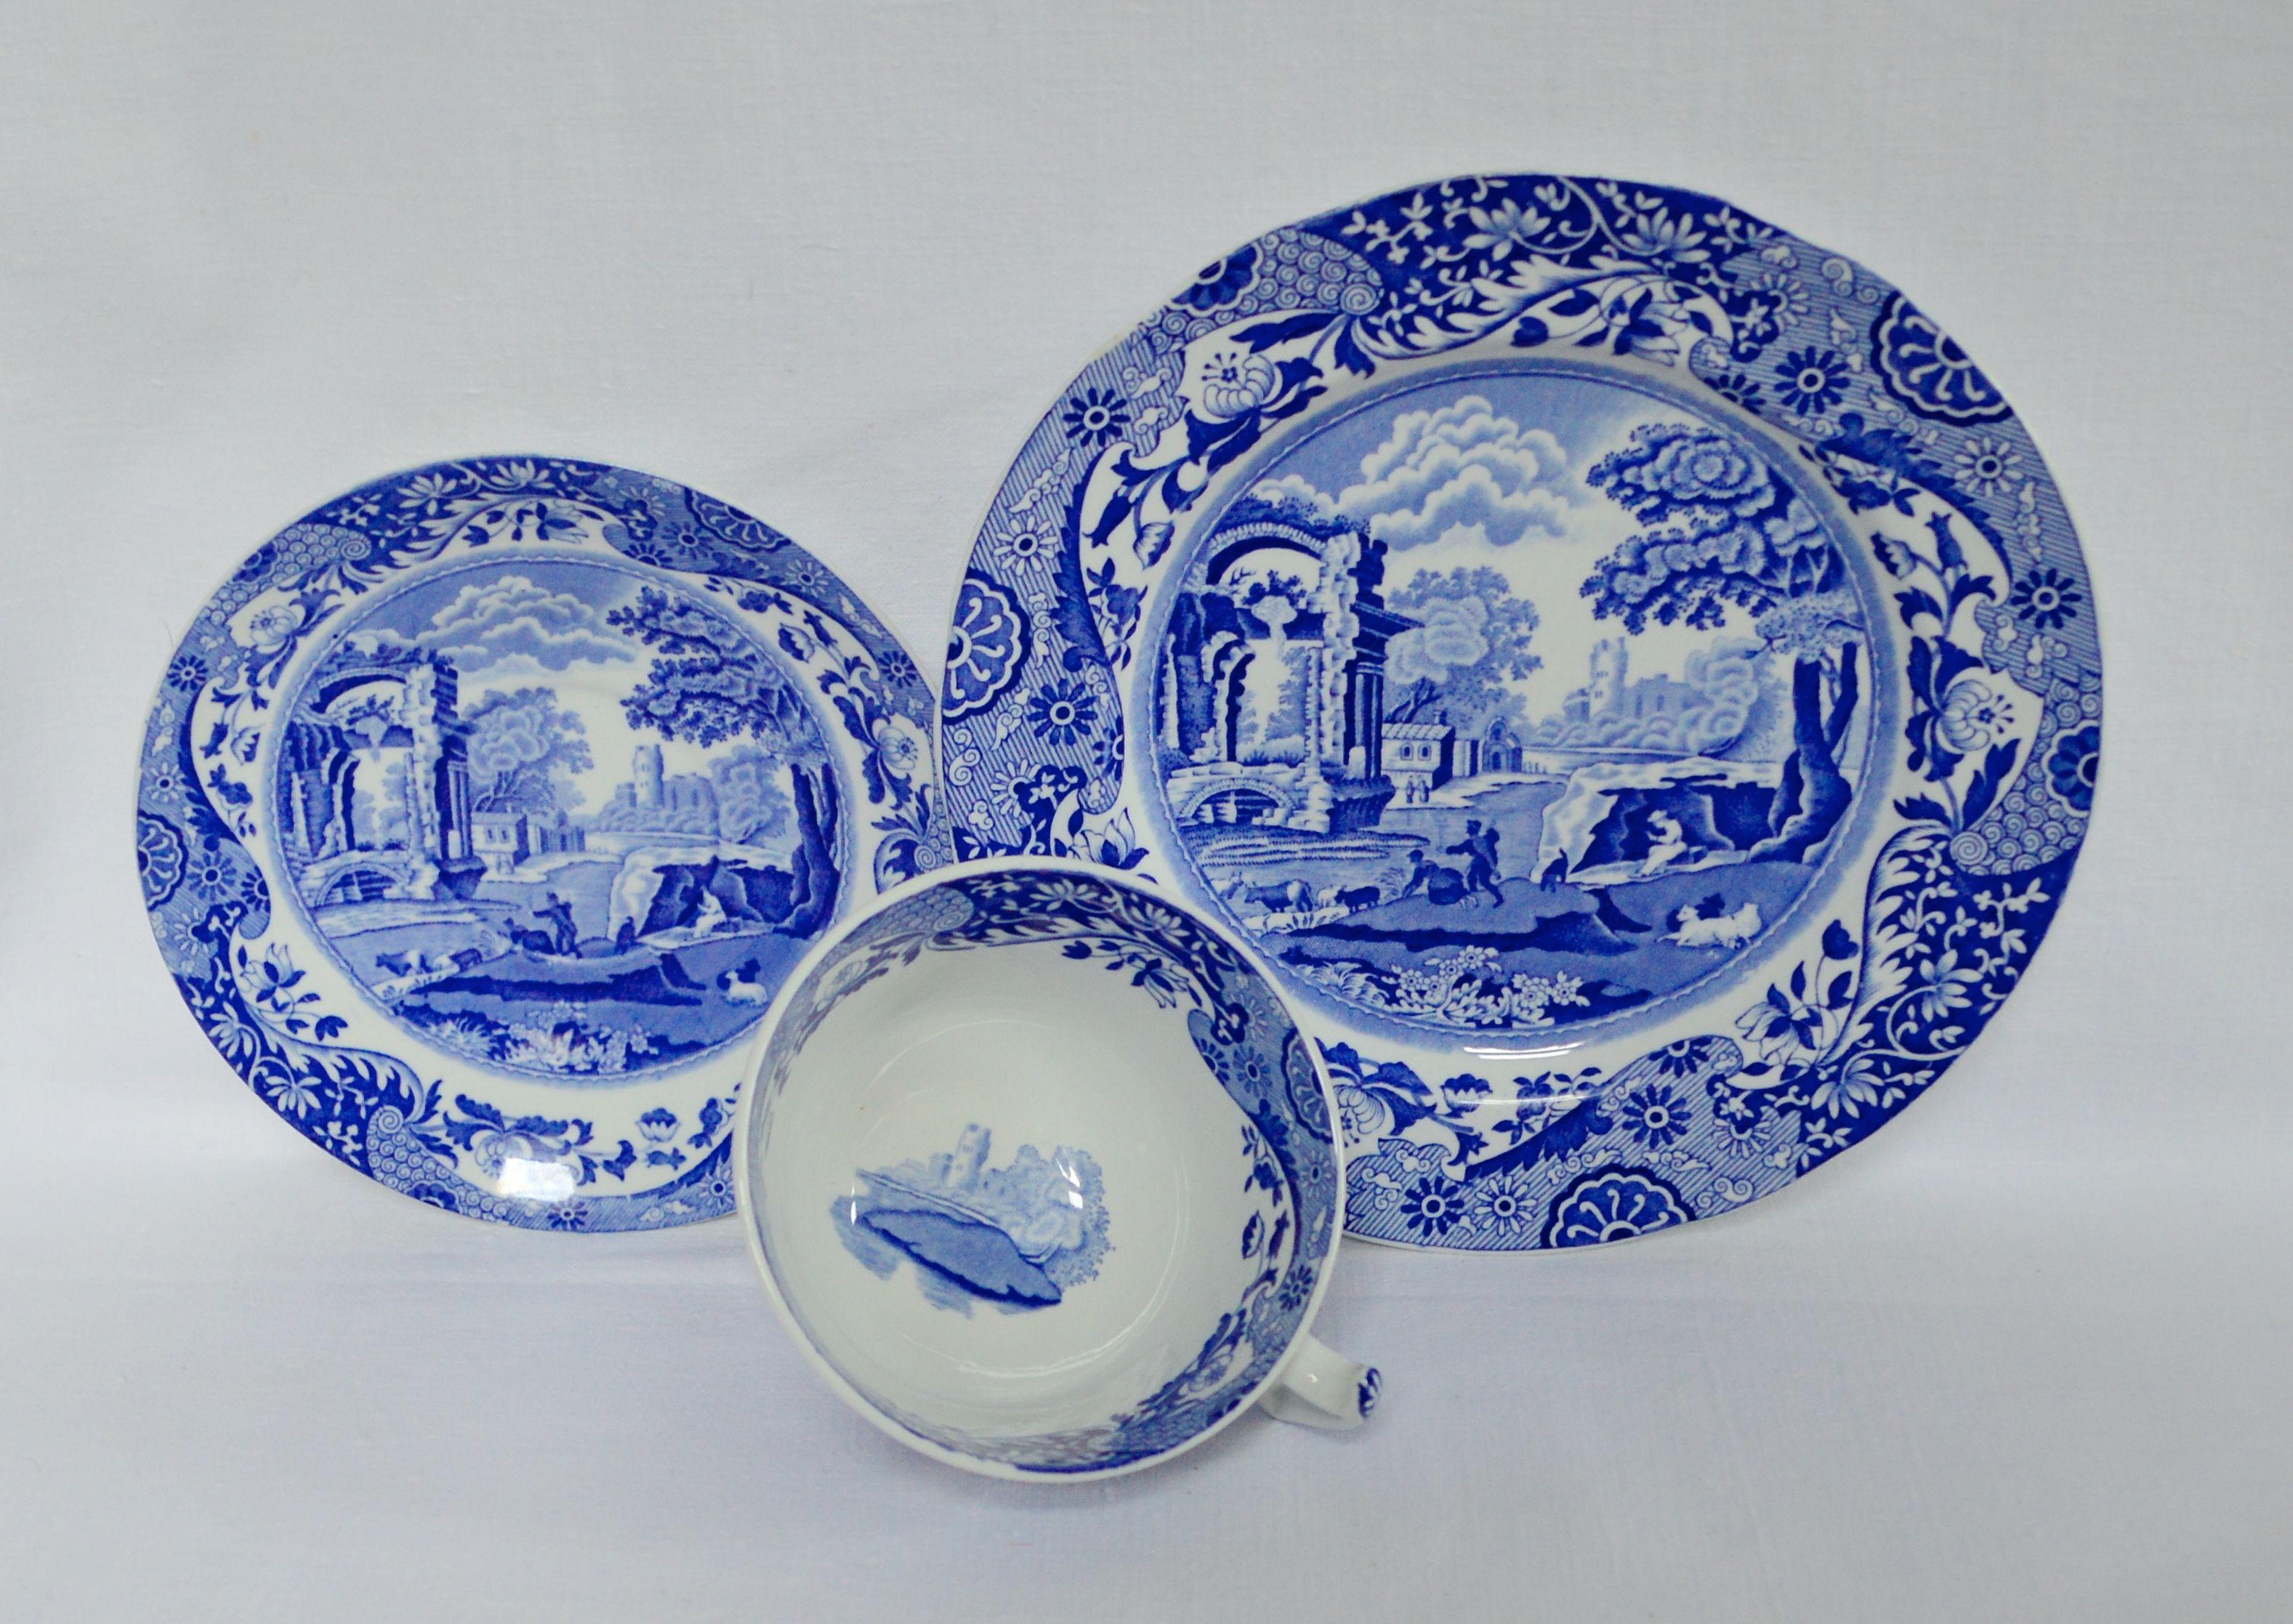 Trio Para Te Copenland Spode Italian England With Images China Tea Sets China Tea Tea Set